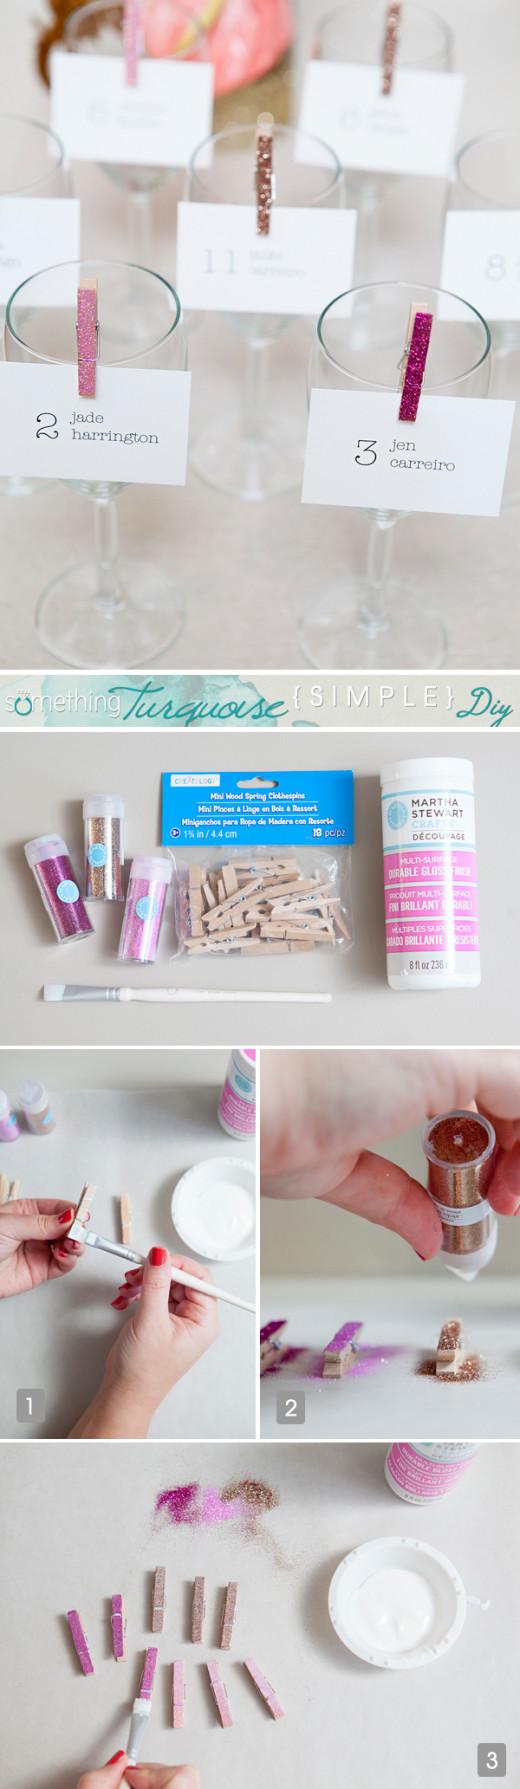 Easy DIY glitter clothespins